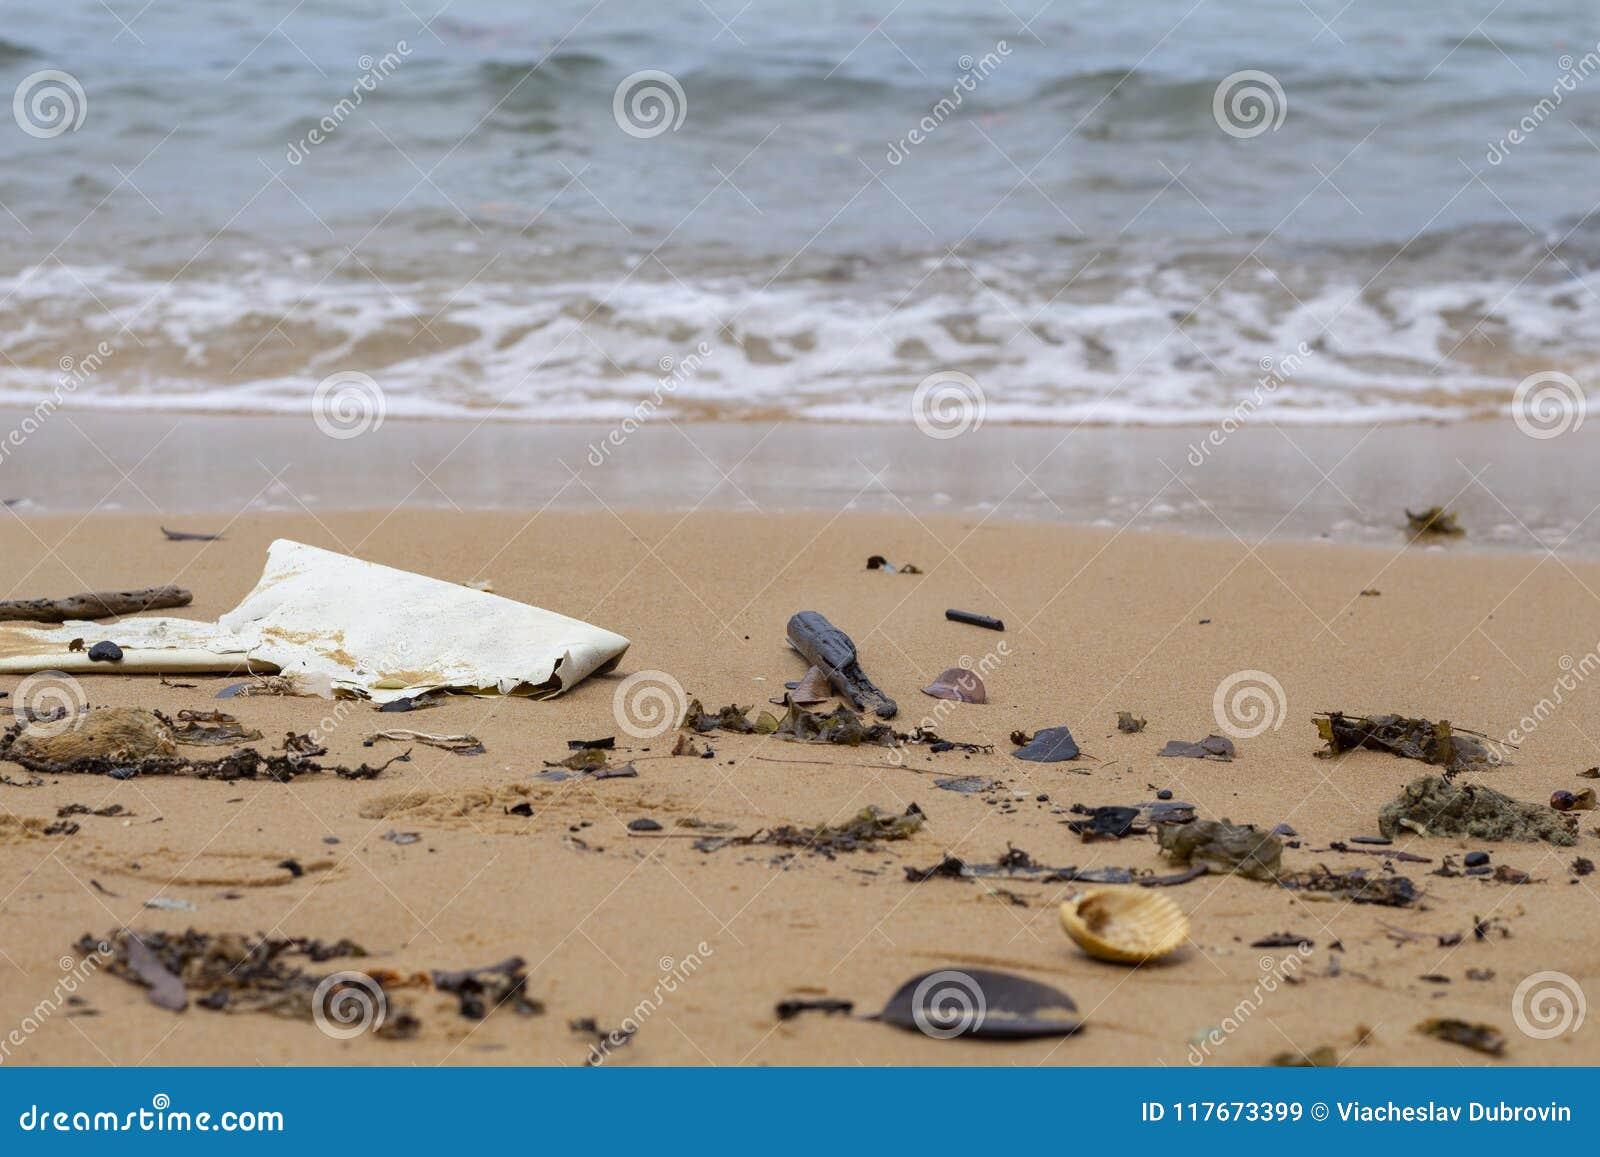 Lixo no litoral Lixo na praia da areia Desastre ecológico no mar Plástico na costa de mar